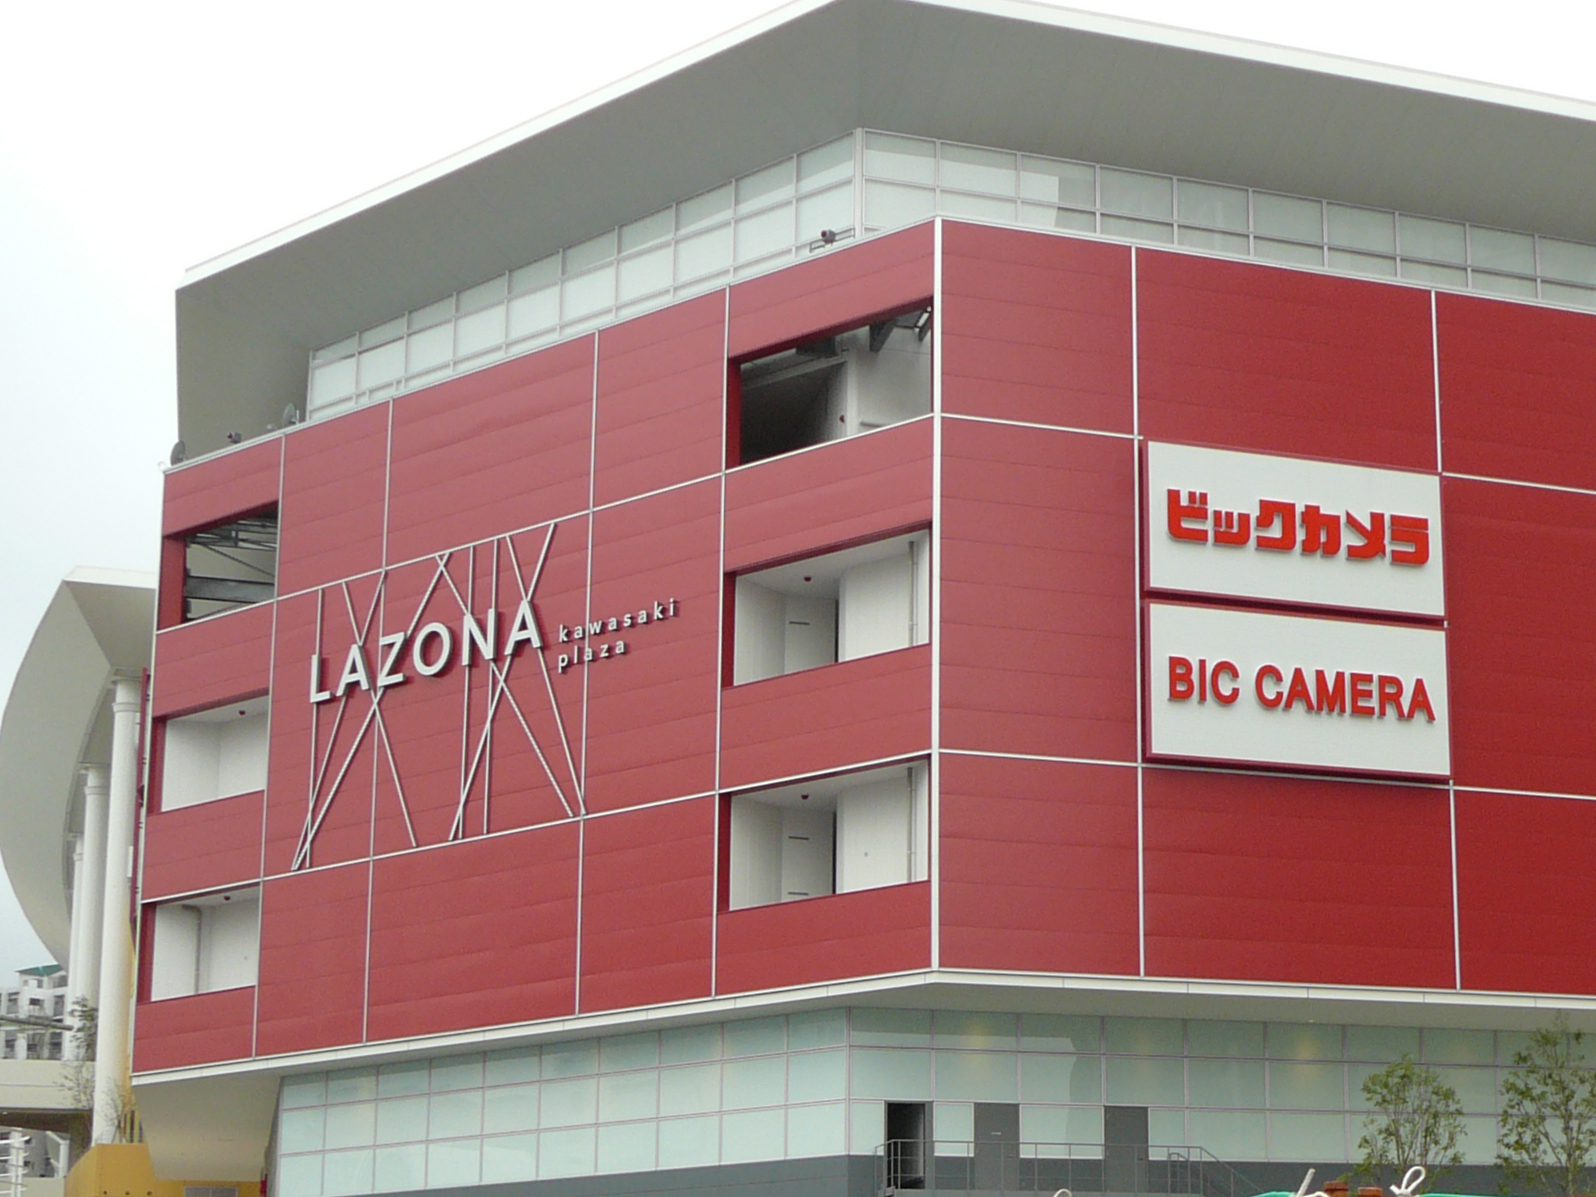 BIC CAMERA LAZONA川崎店